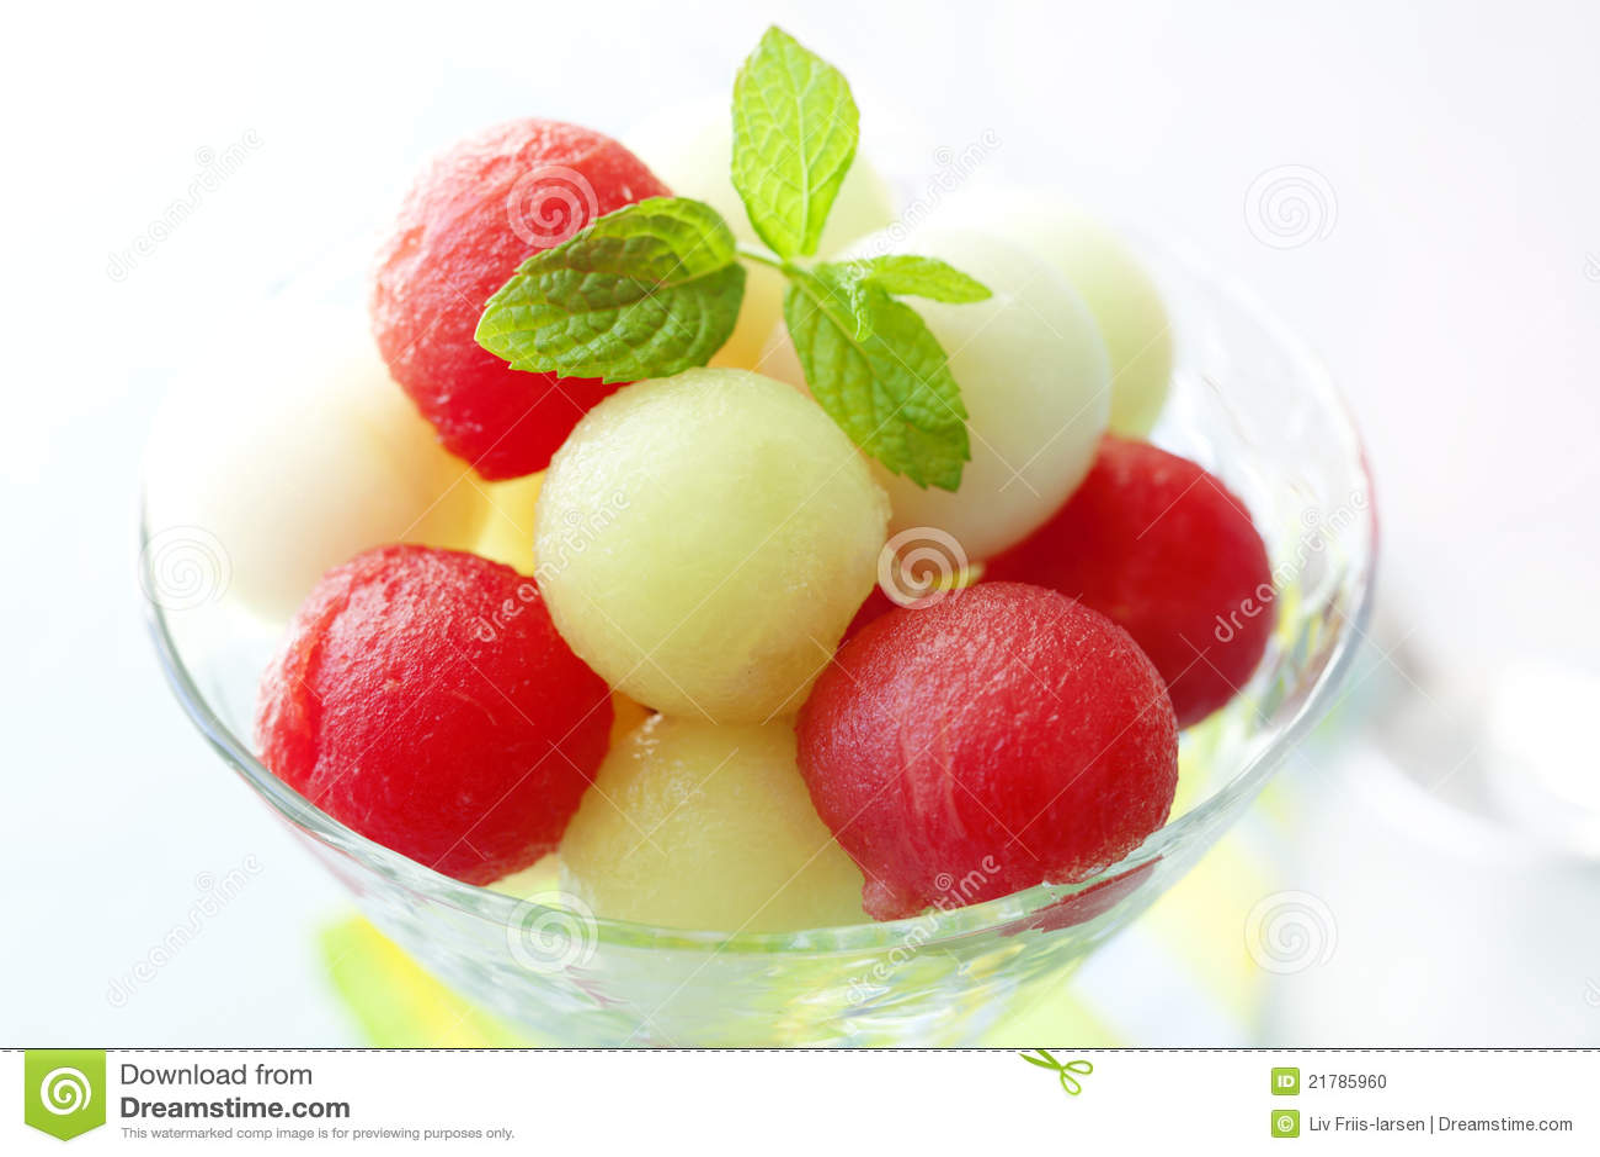 Melon Balls Stock Photo - Image: 21785960